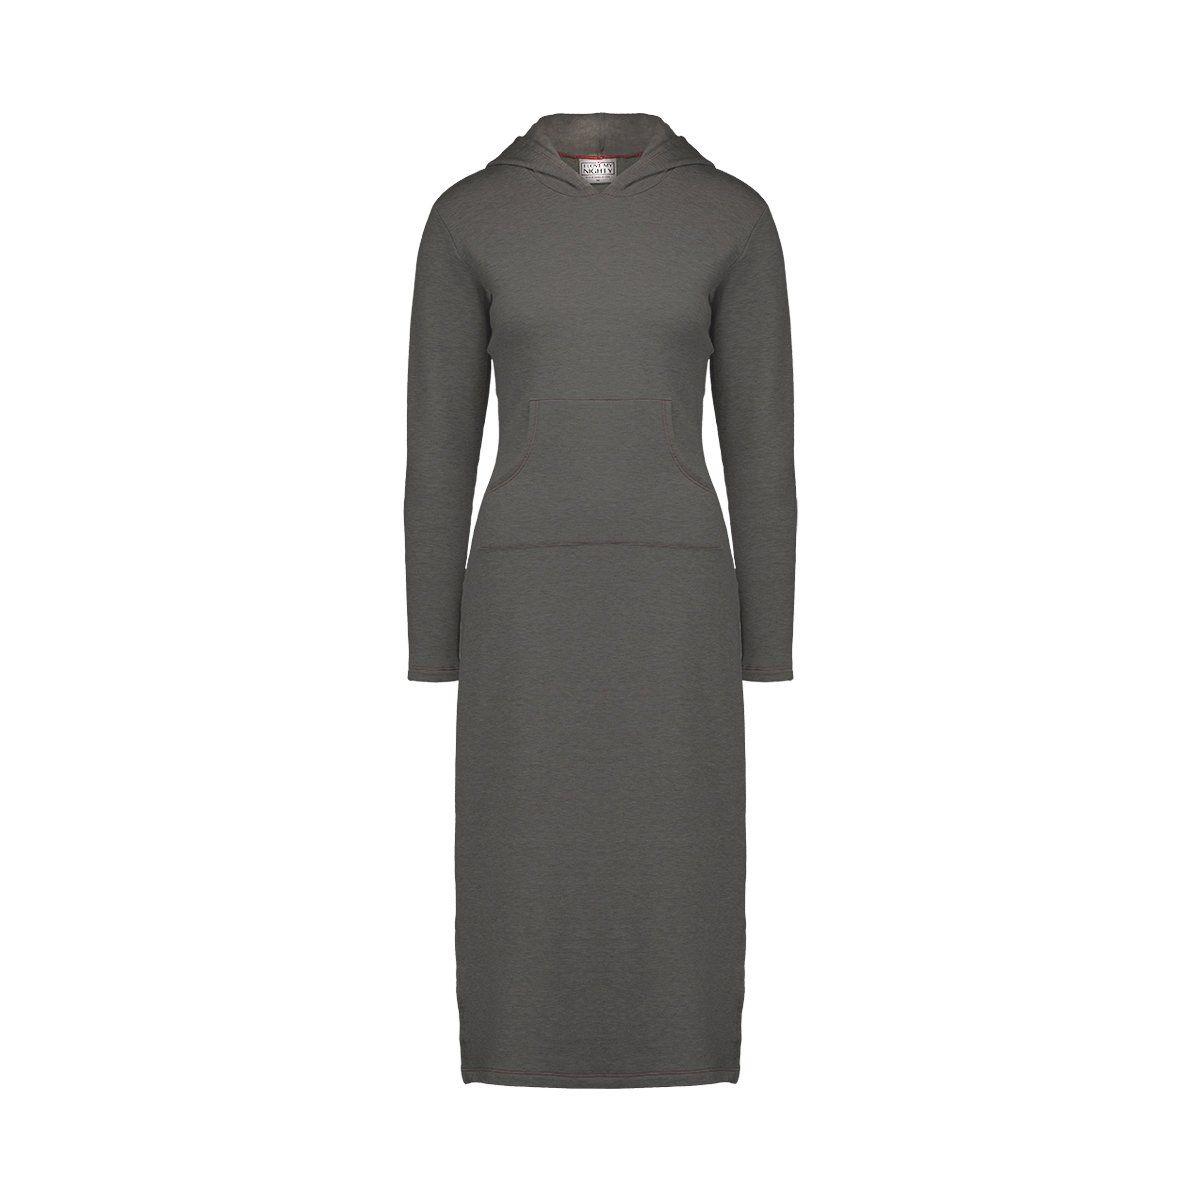 Julie Lu Fleece Hooded Nightgown – Charcoal Grey / 4